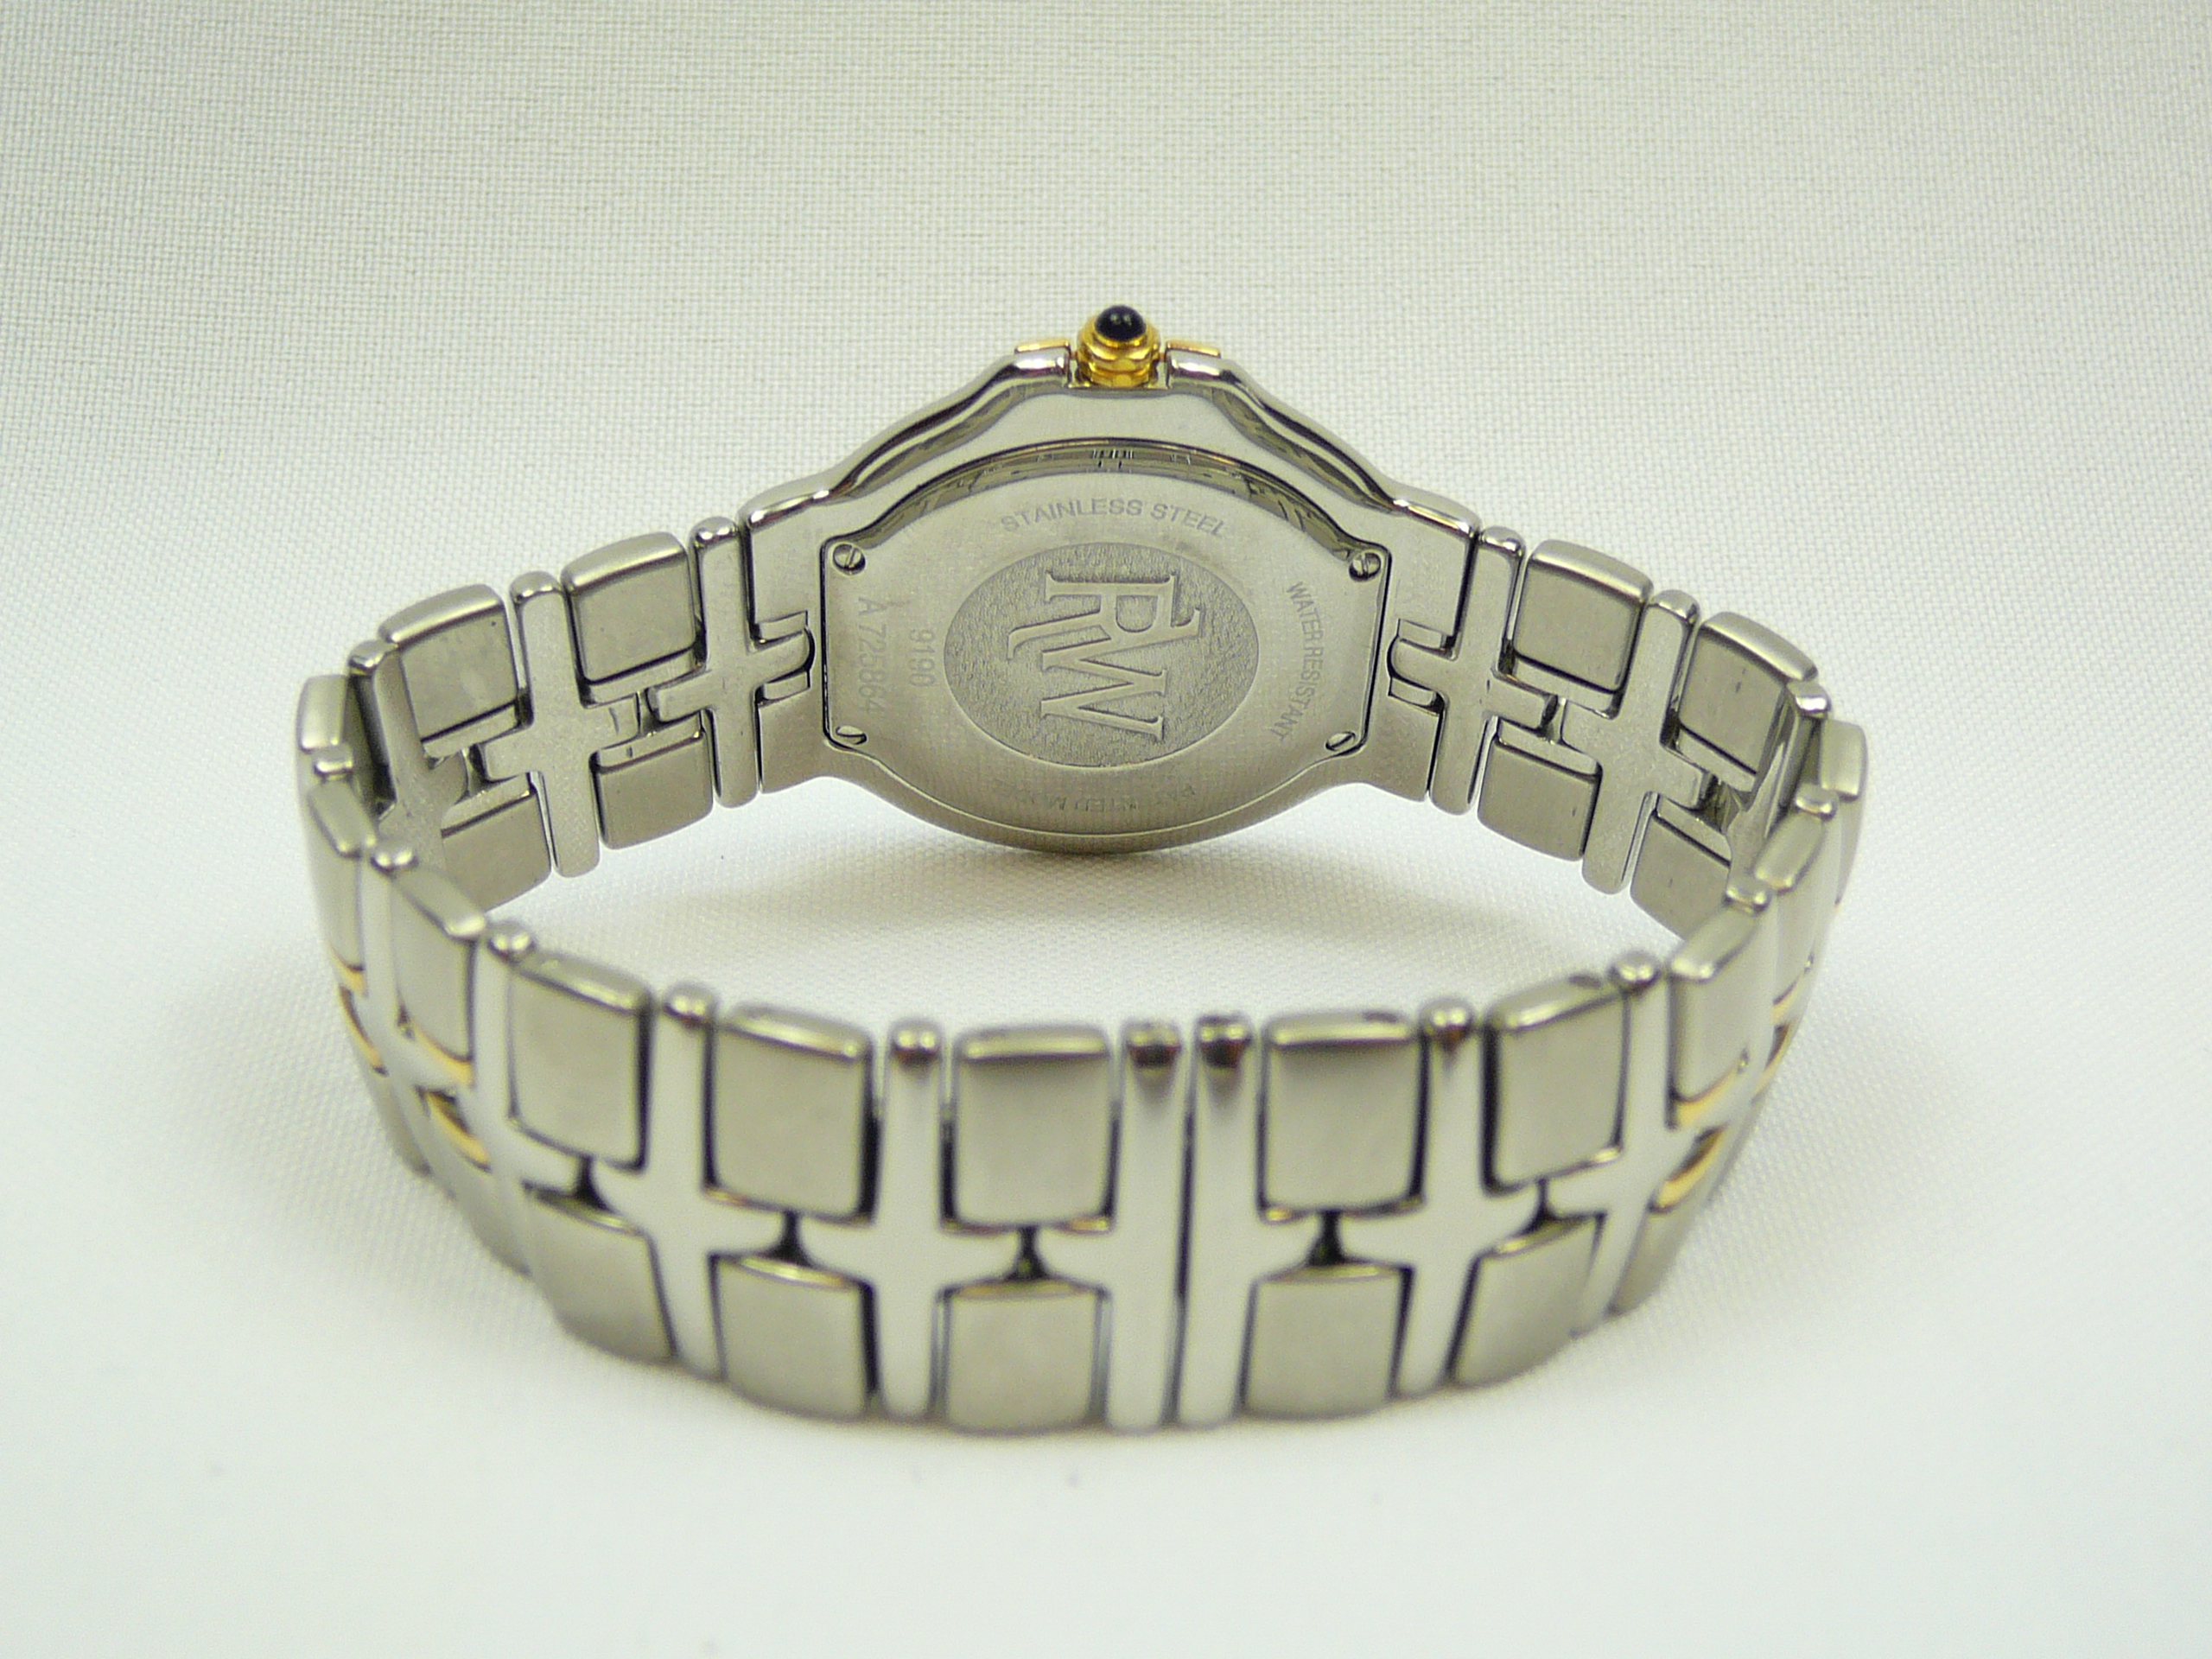 Gents Raymond Weil Wrist Watch - Image 3 of 3